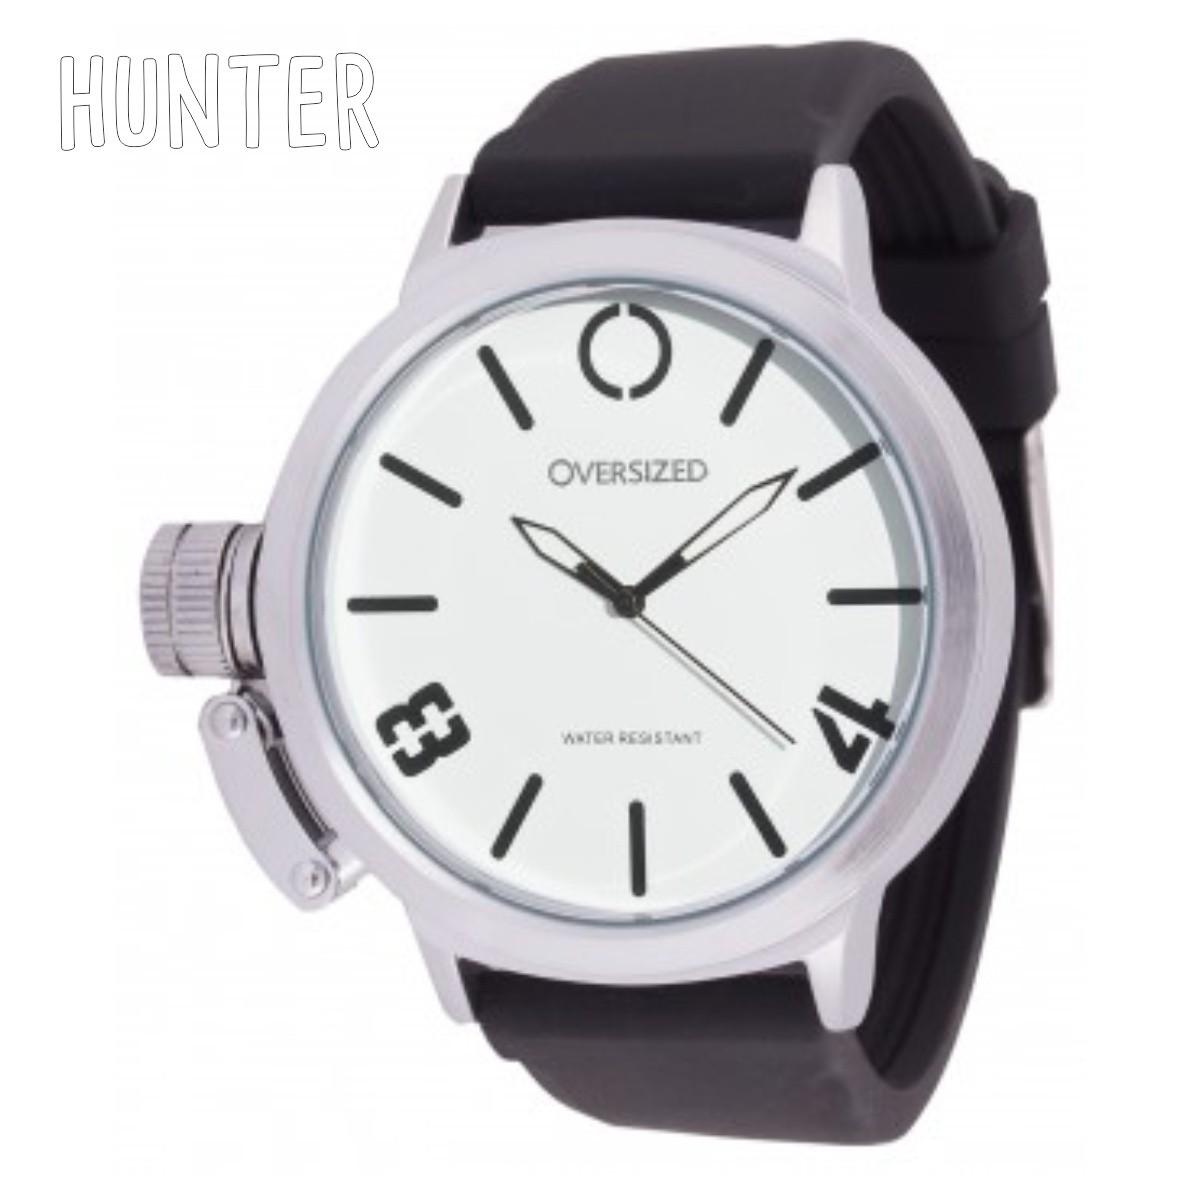 Relógio Masculino Oversized Hunter